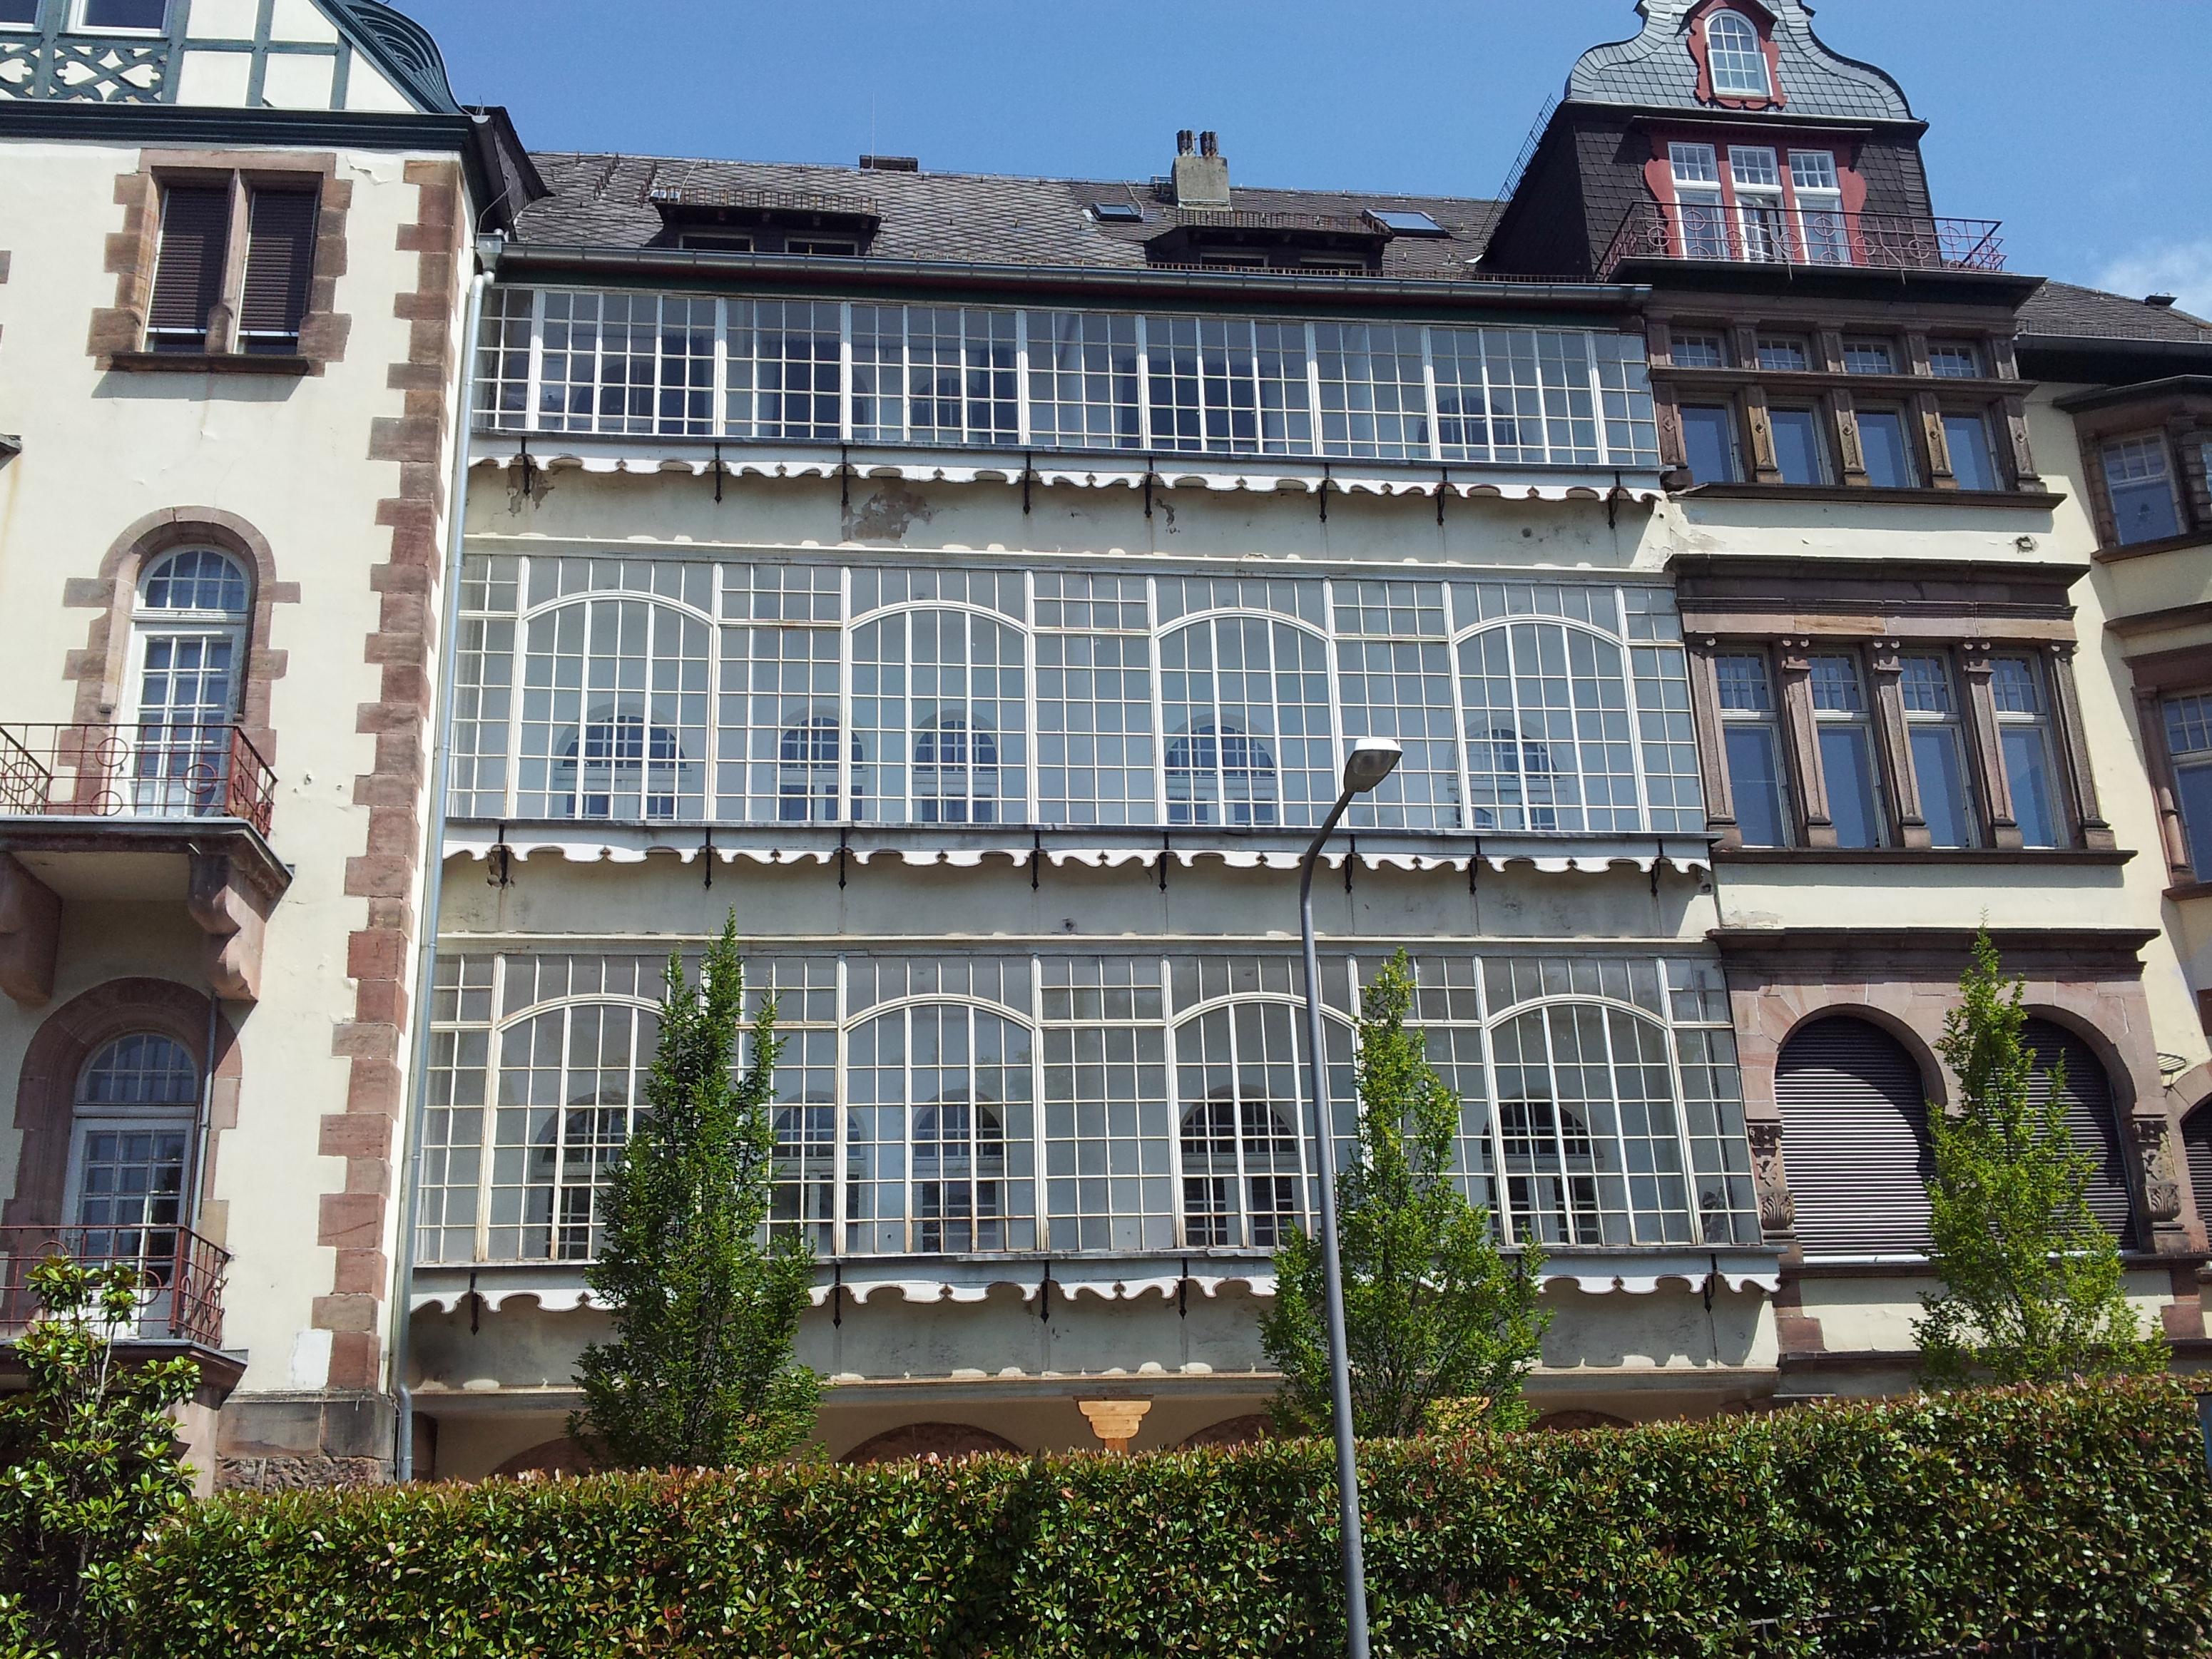 Datei Balkon Verglasung Wiesbaden Jpg Wikipedia